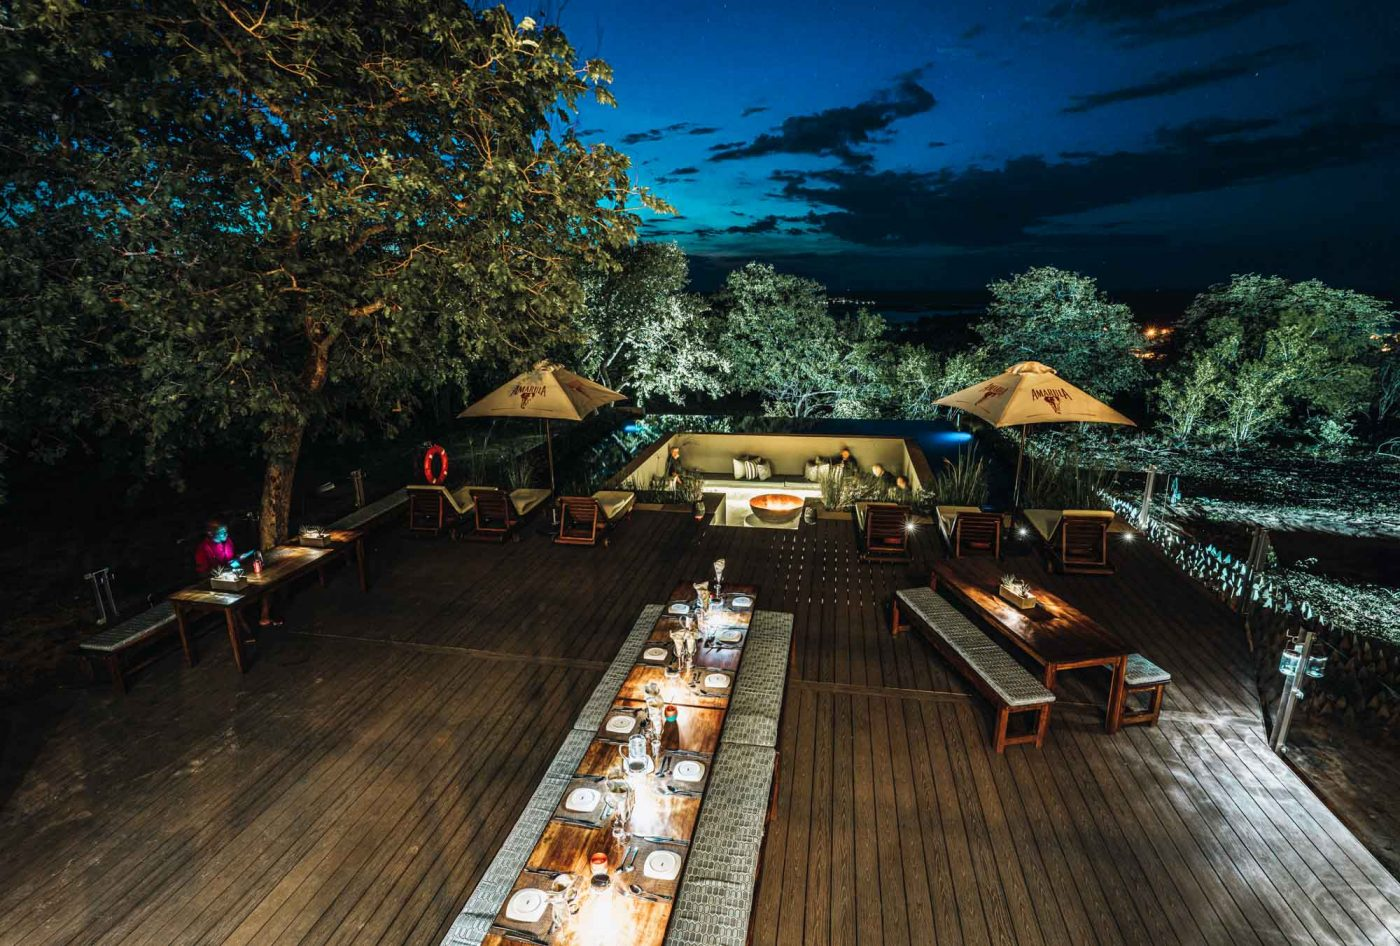 Evening fireside chats at Pangolin Chobe Hotel